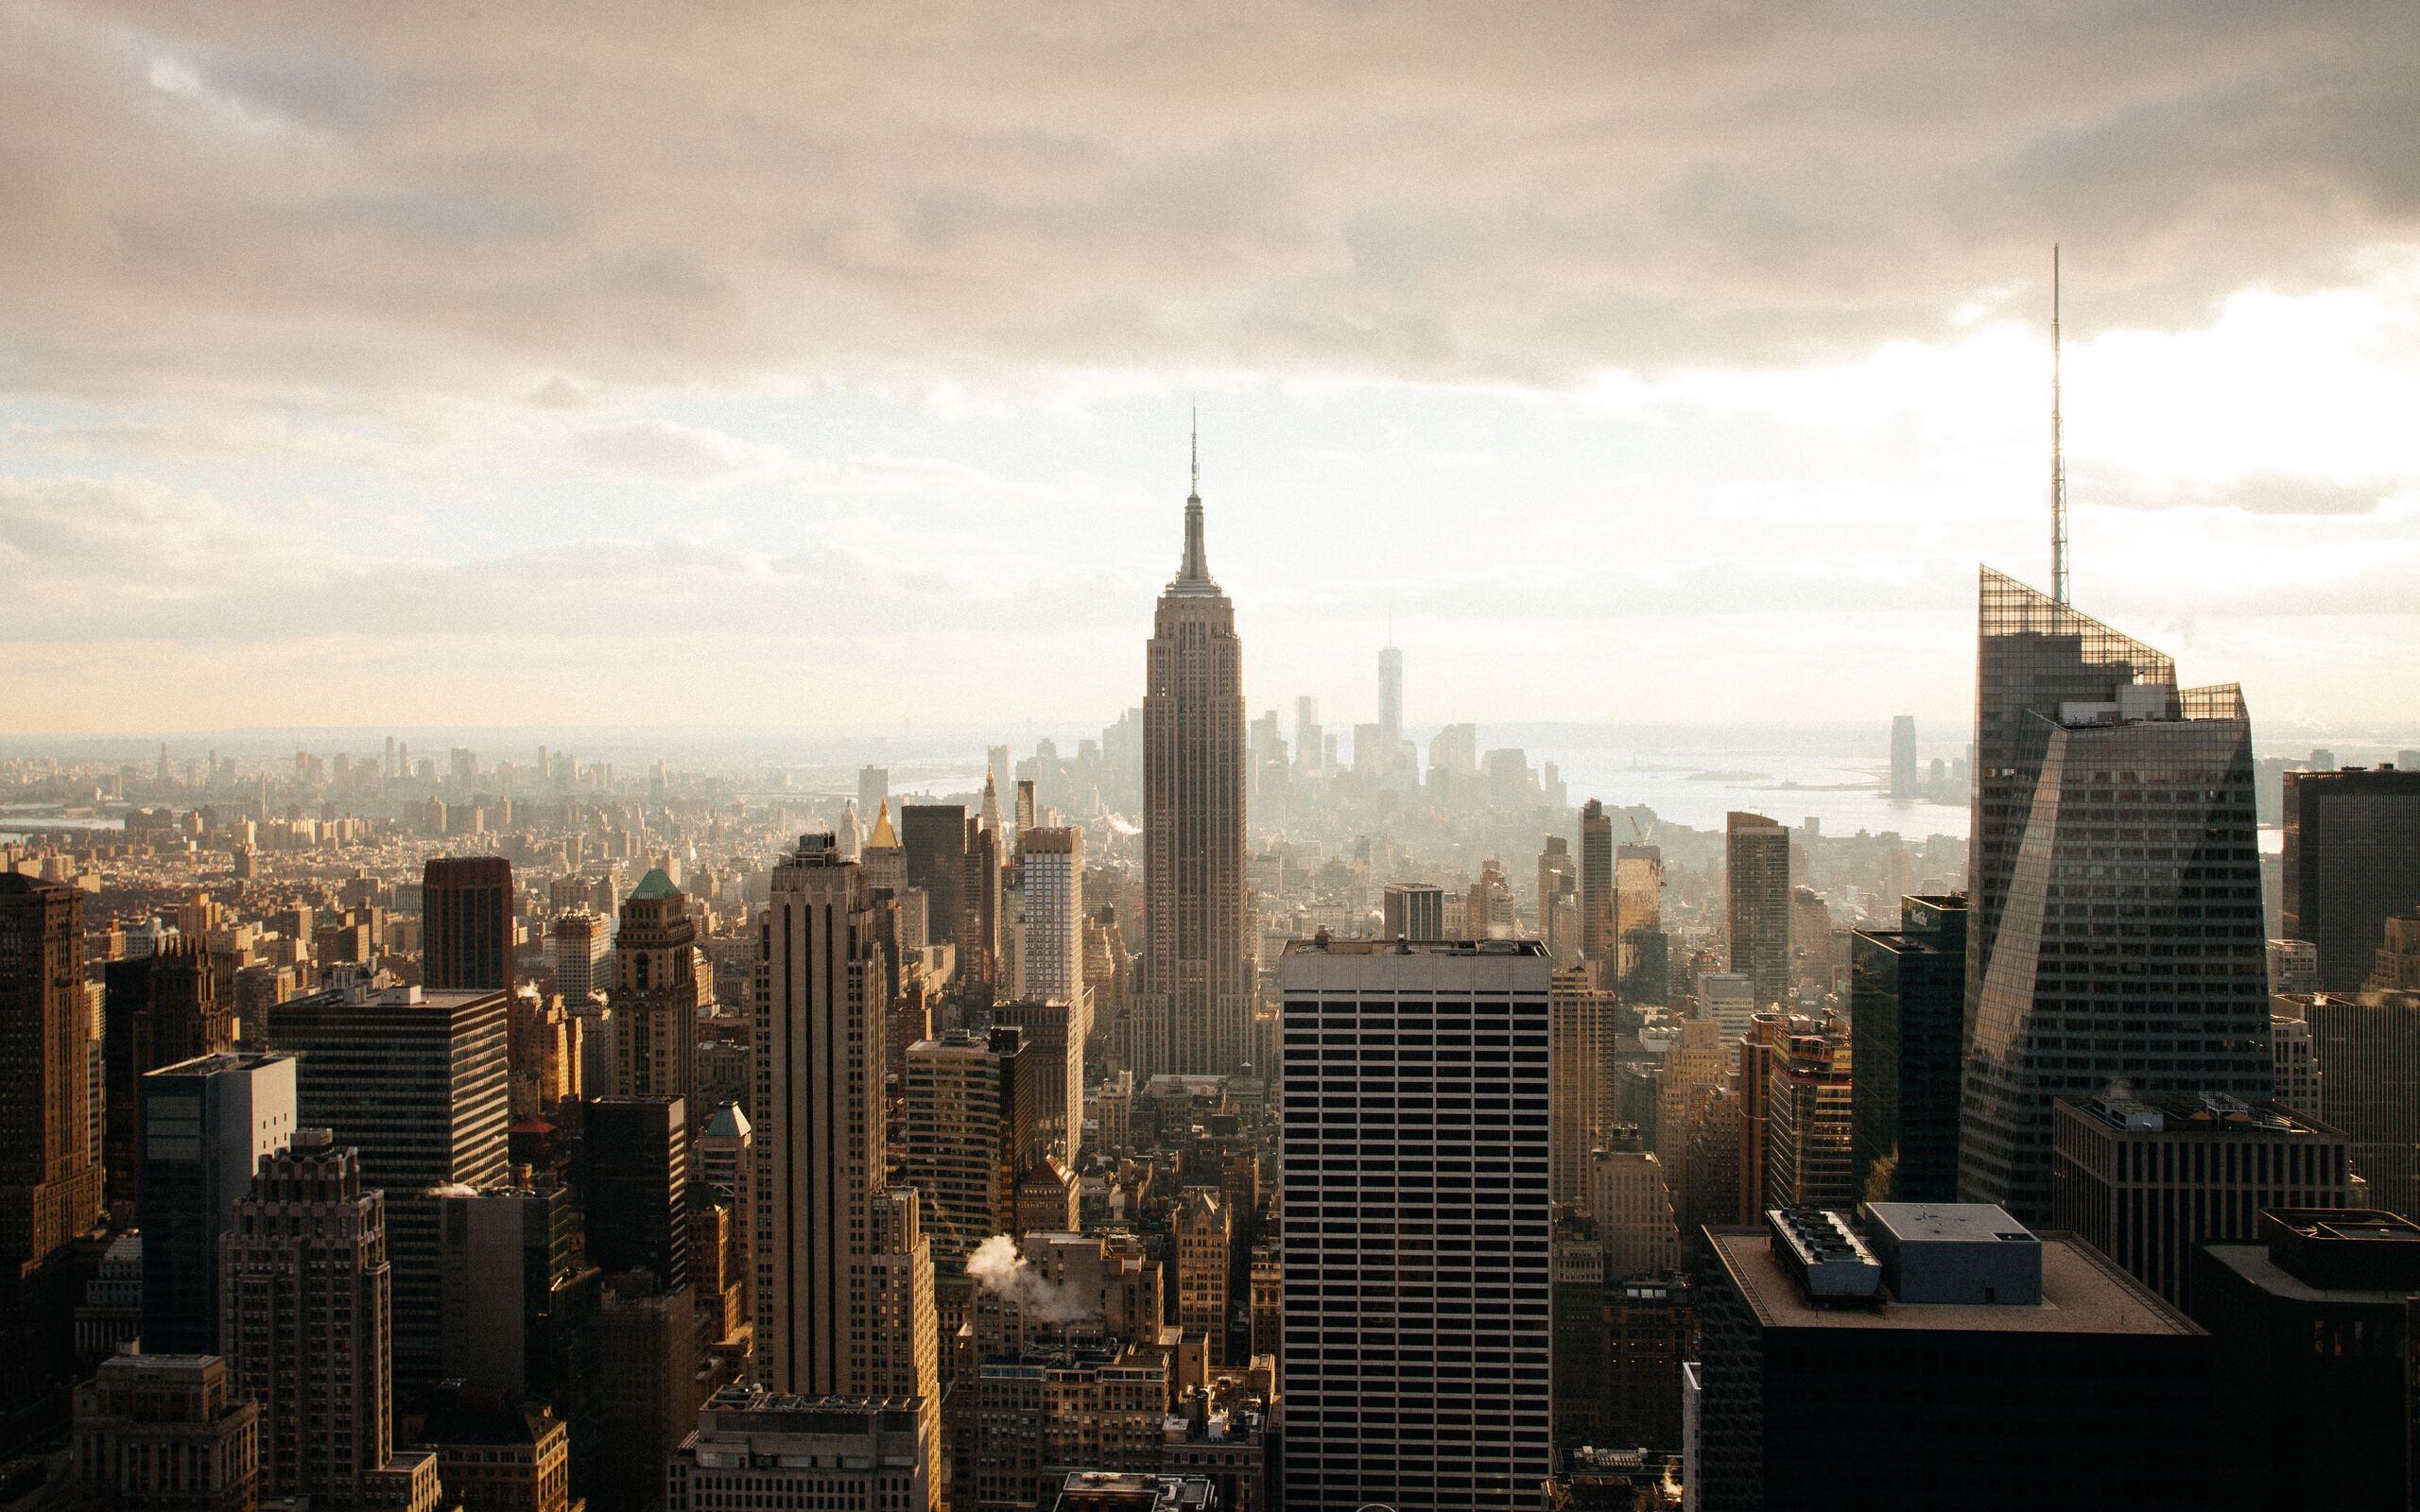 empire-state-building-skyscraper-7v.jpg